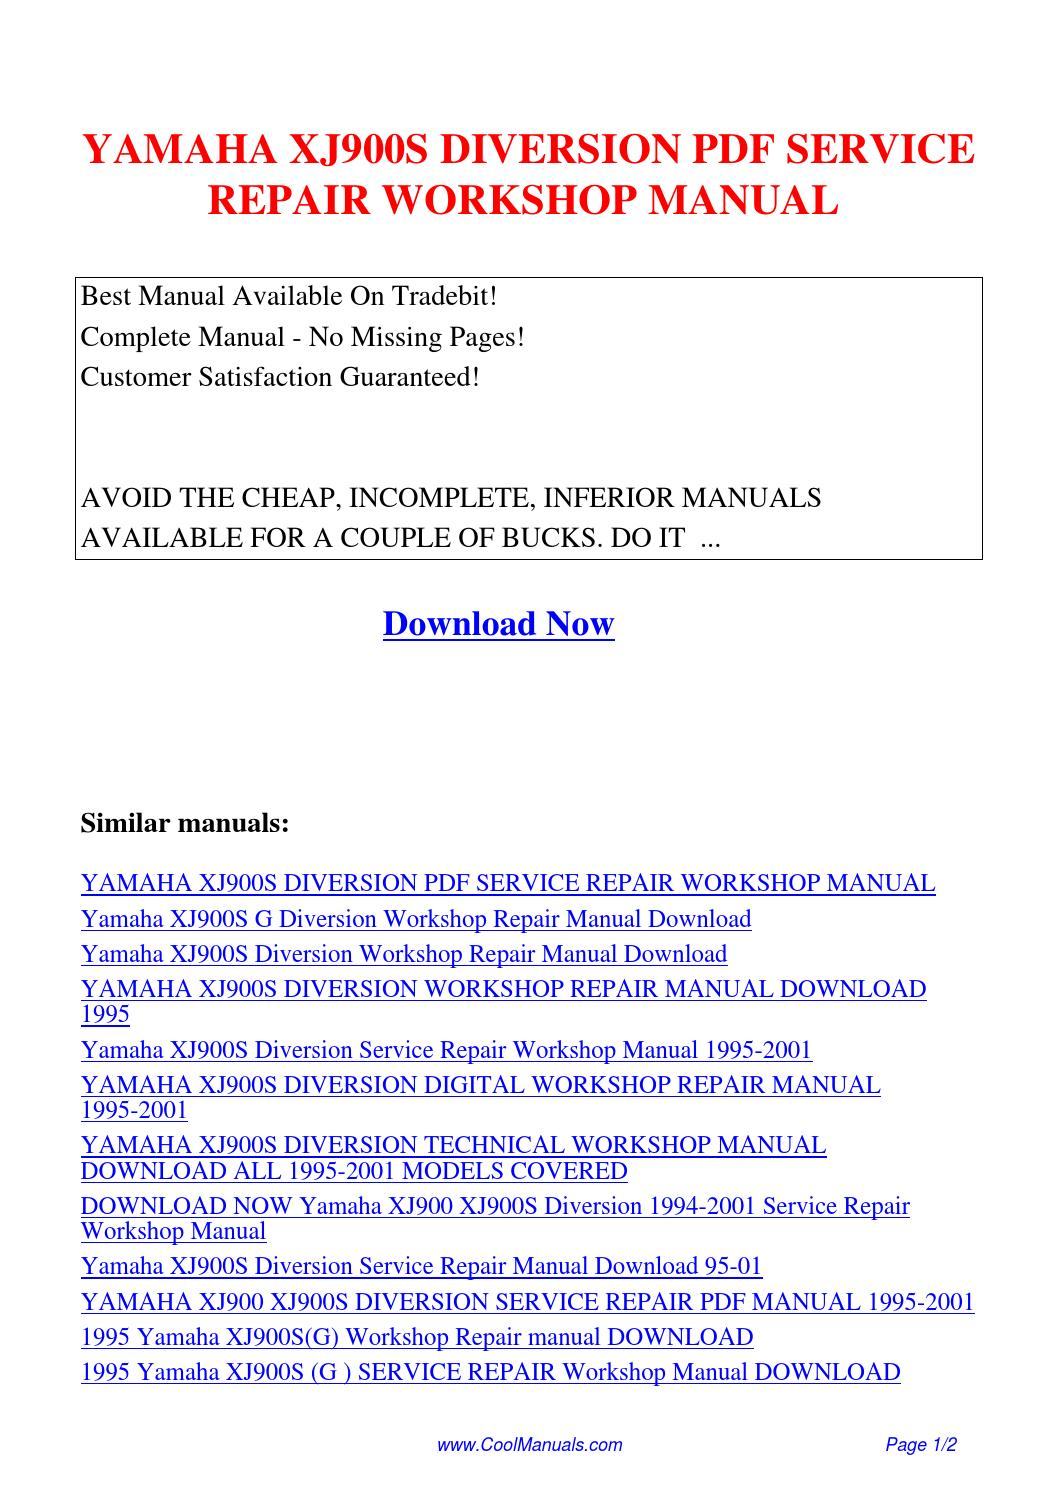 Yamaha Xj900s Diversion Service Repair Workshop Manual Pdf